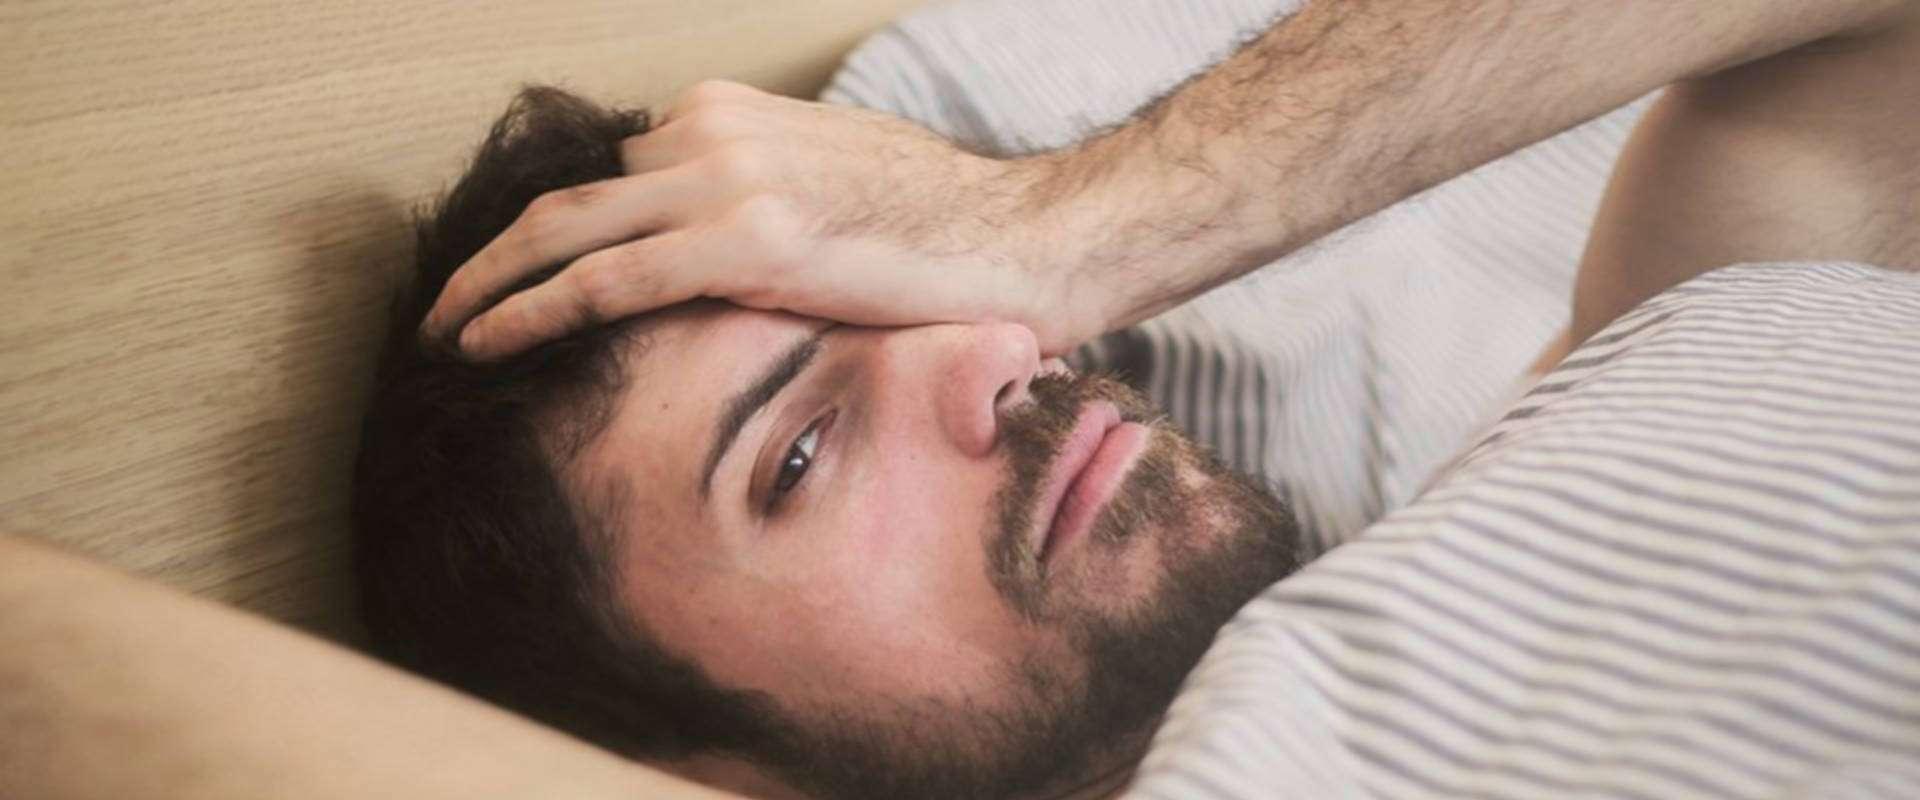 darshanatura-insonnia-caldo-sonno-stress-header